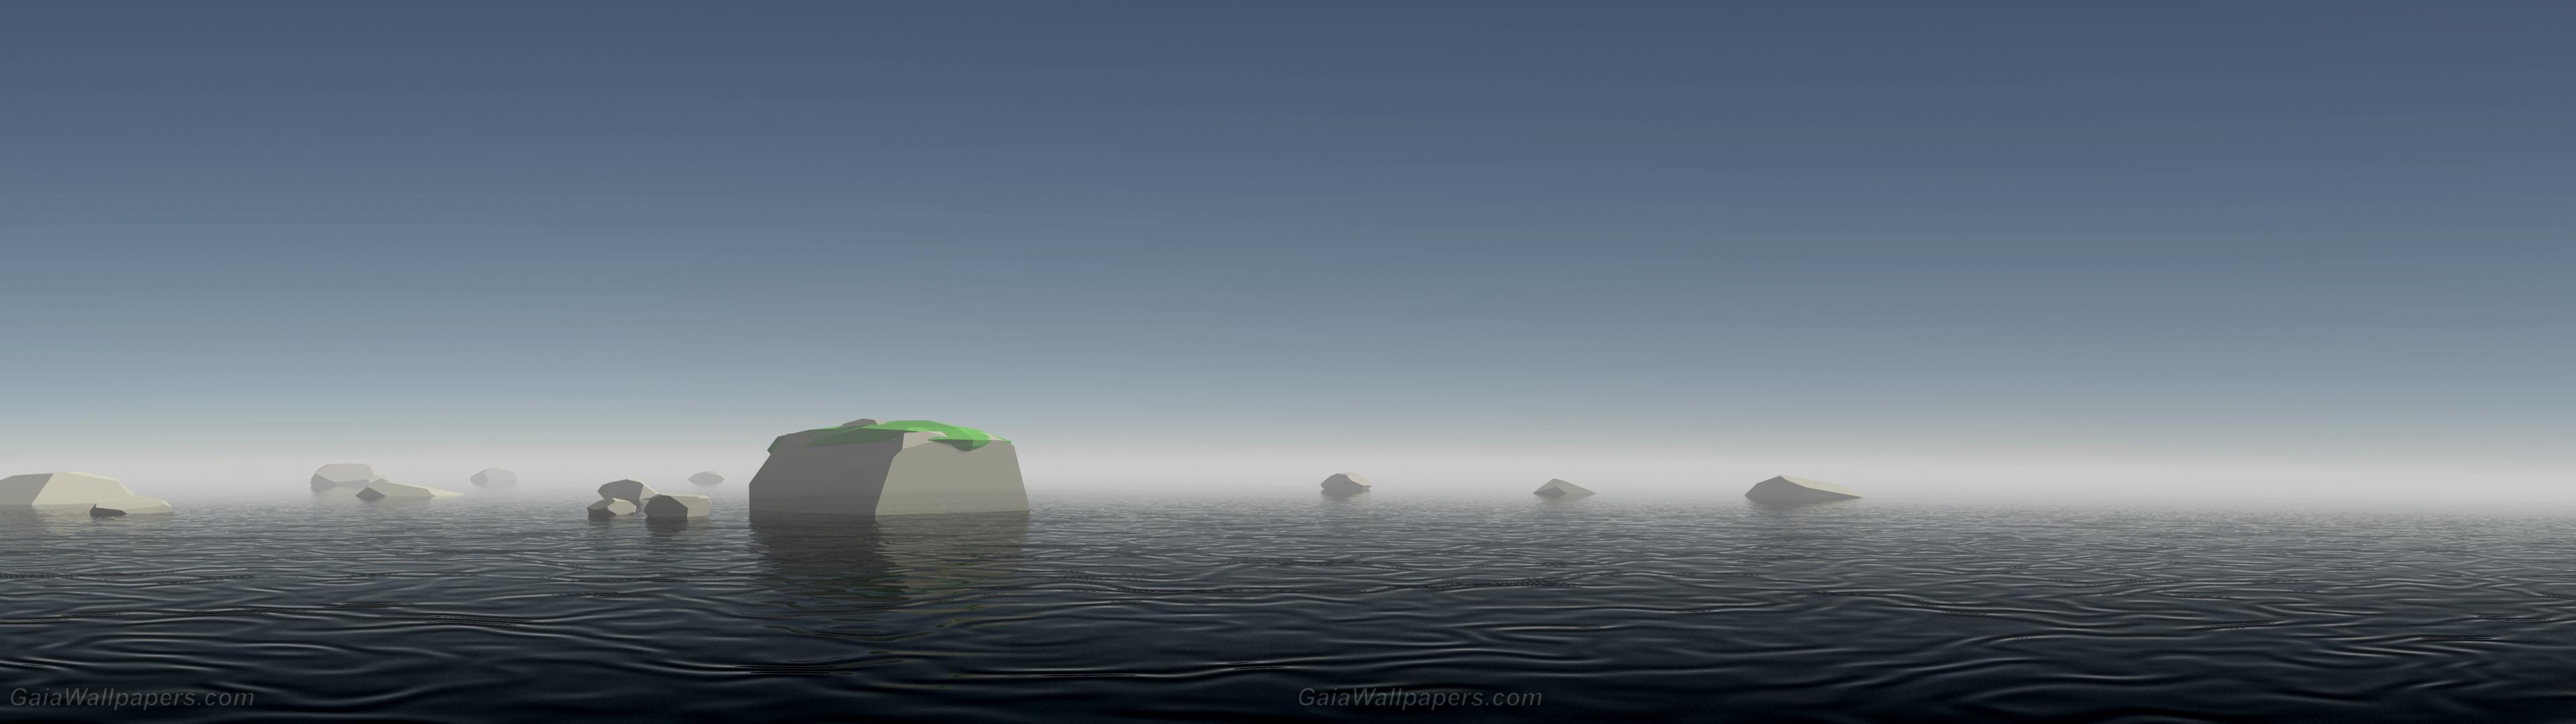 Reef of desolation - Free desktop wallpapers